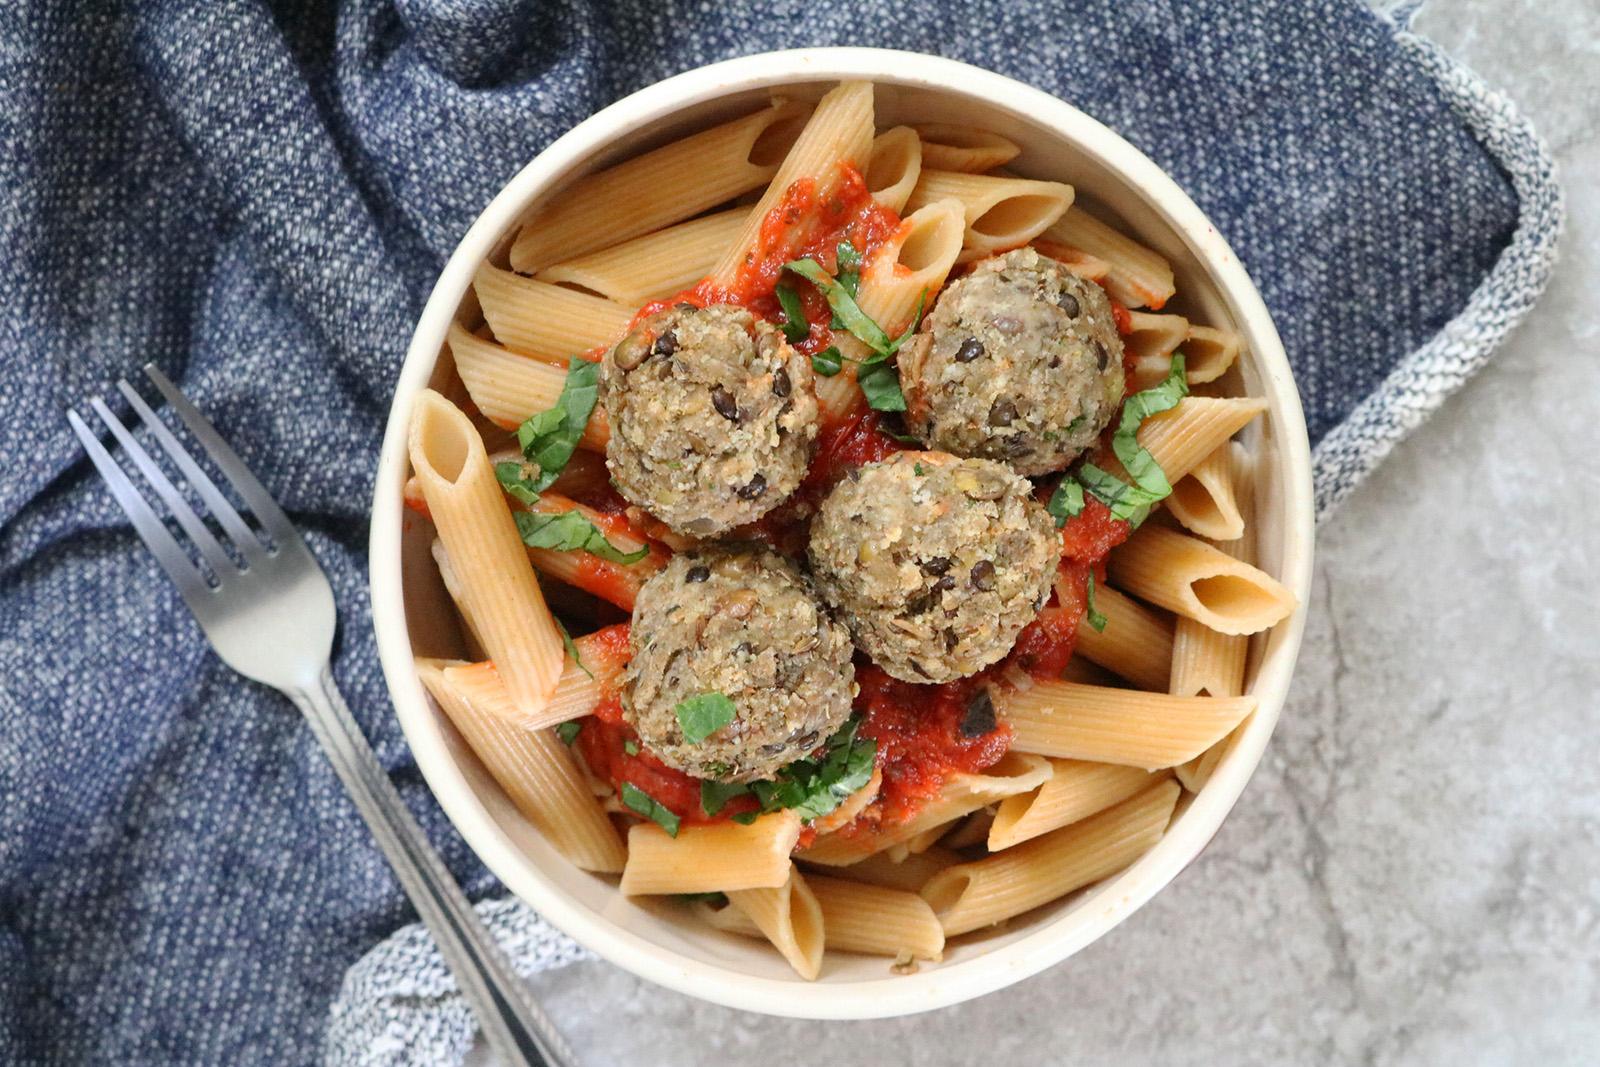 Lentil Eggplant Meatballs